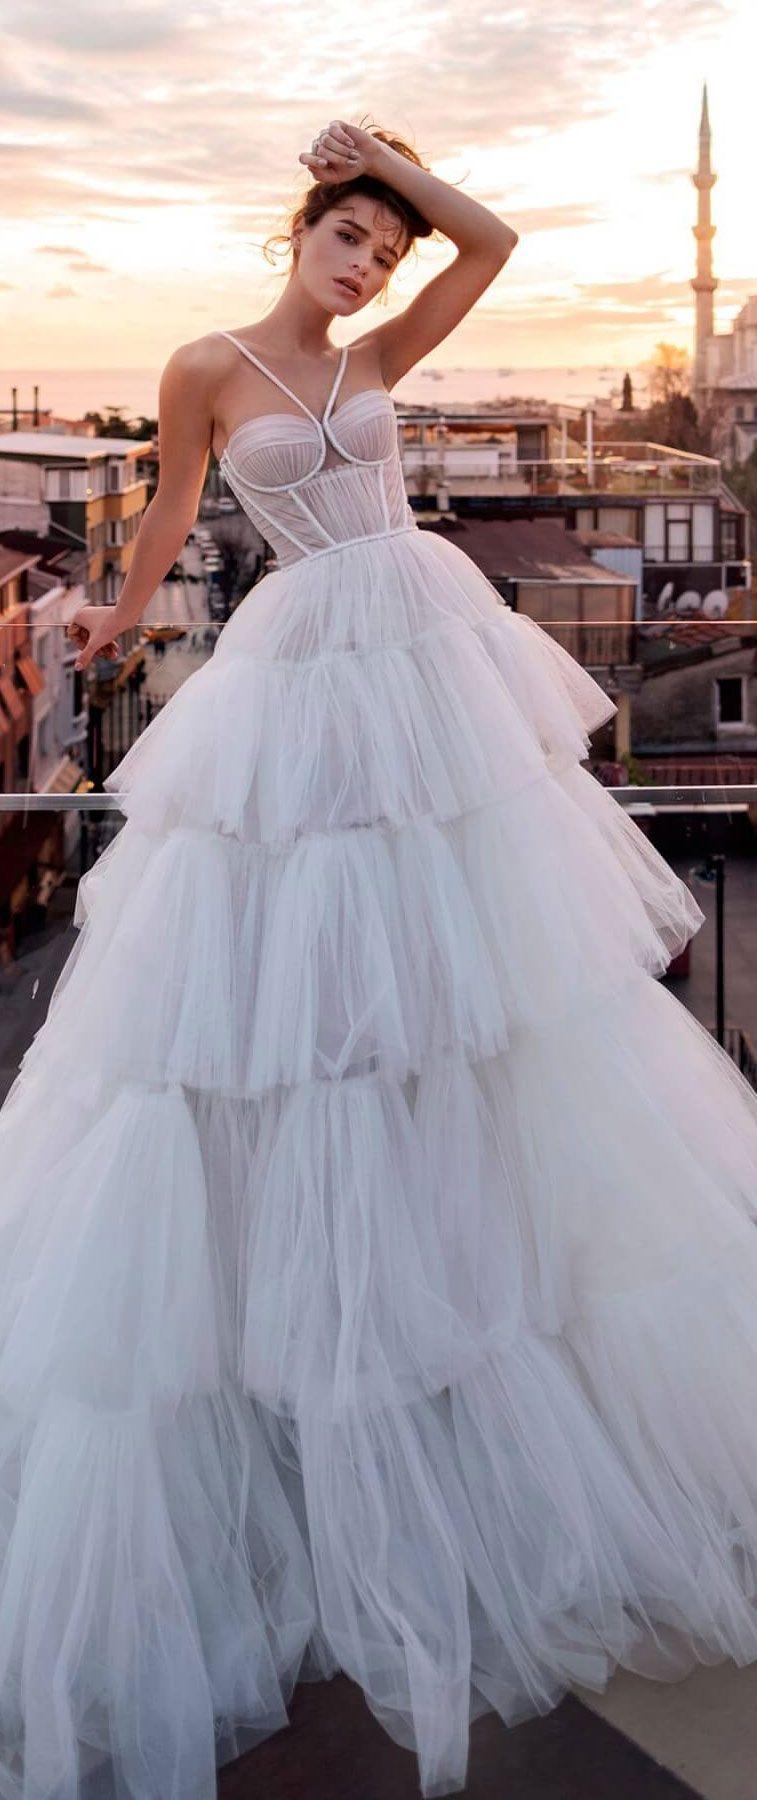 f8c1cfa1380 Sweetheart Neckline Ruffle Skirt Wedding Dress - Gomes Weine AG